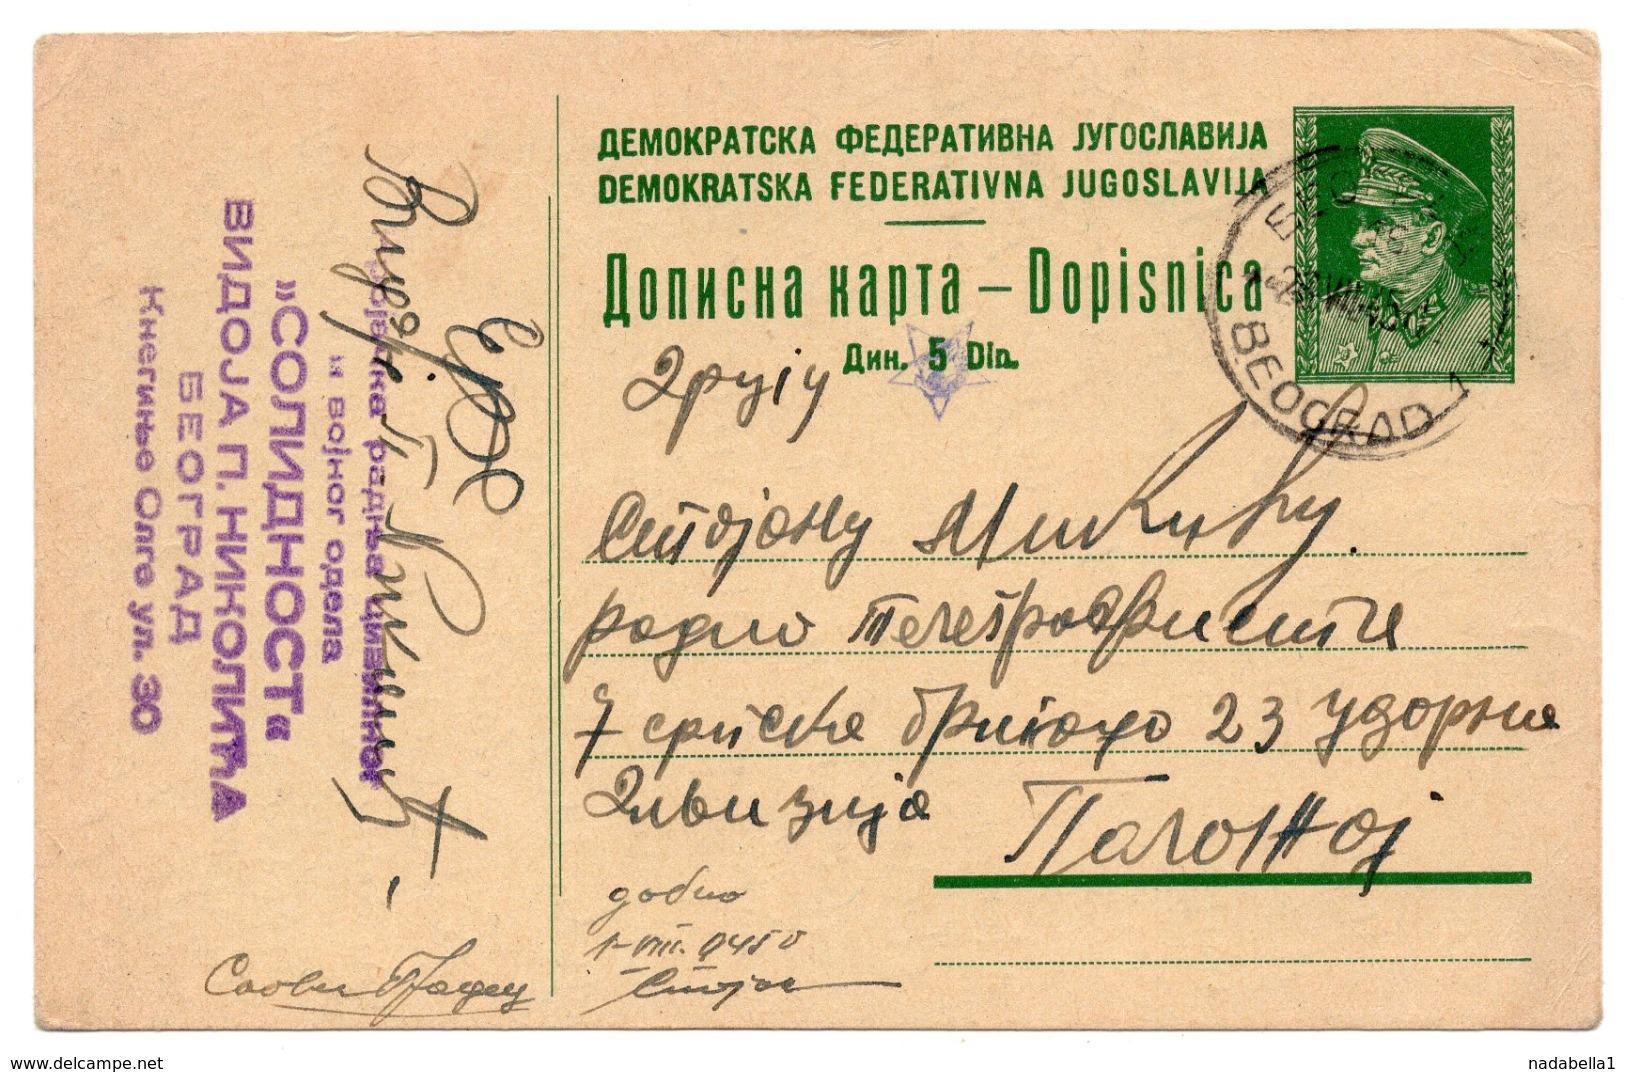 23.07.1945. DF YUGOSLAVIA, TITO, 5 DINARA, OVER PRINT WITH STAR, STATIONERY CARD, USED - Postal Stationery